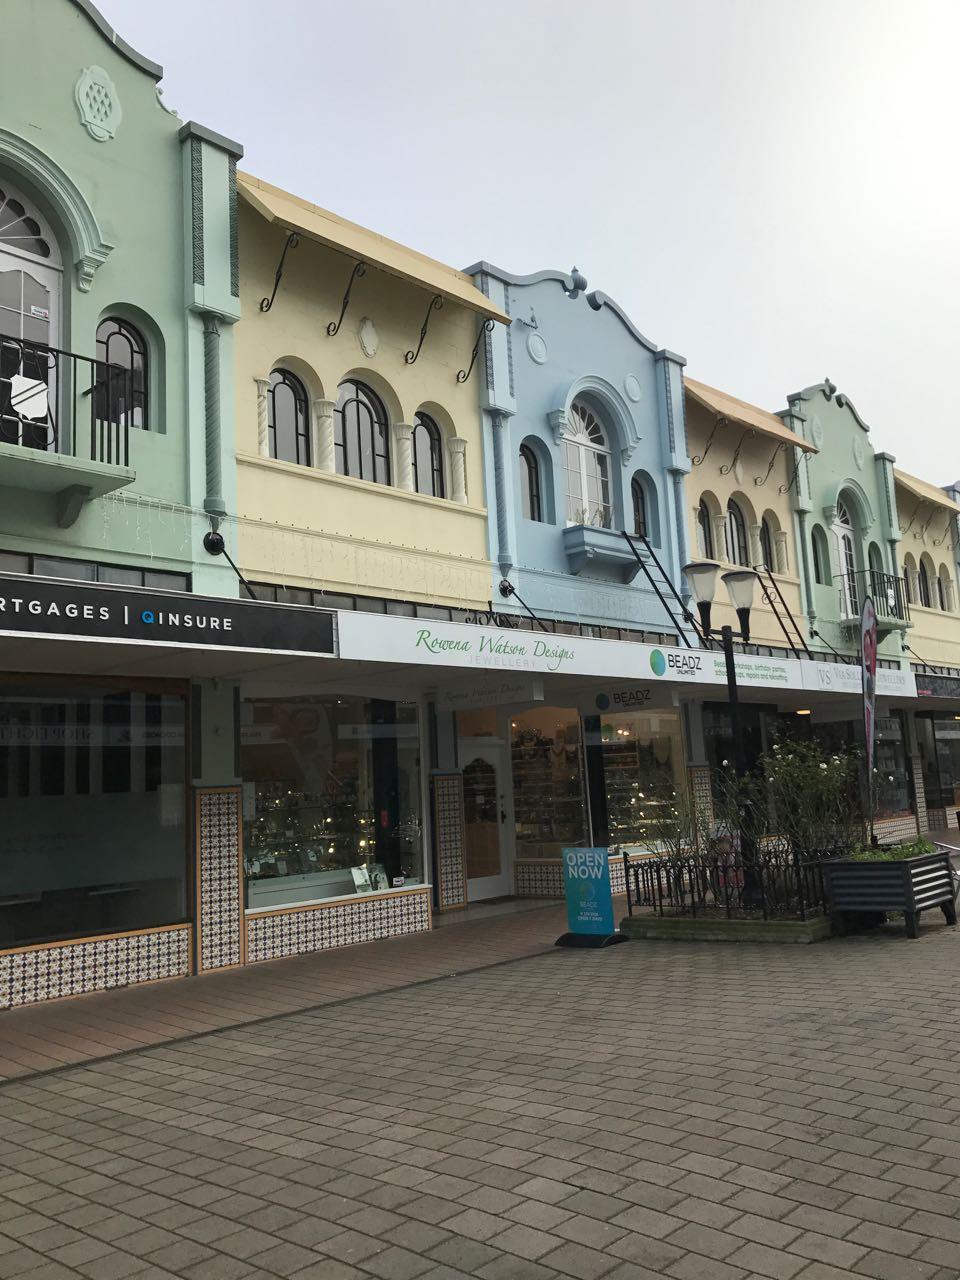 New Regents Street Christchurch.jpg